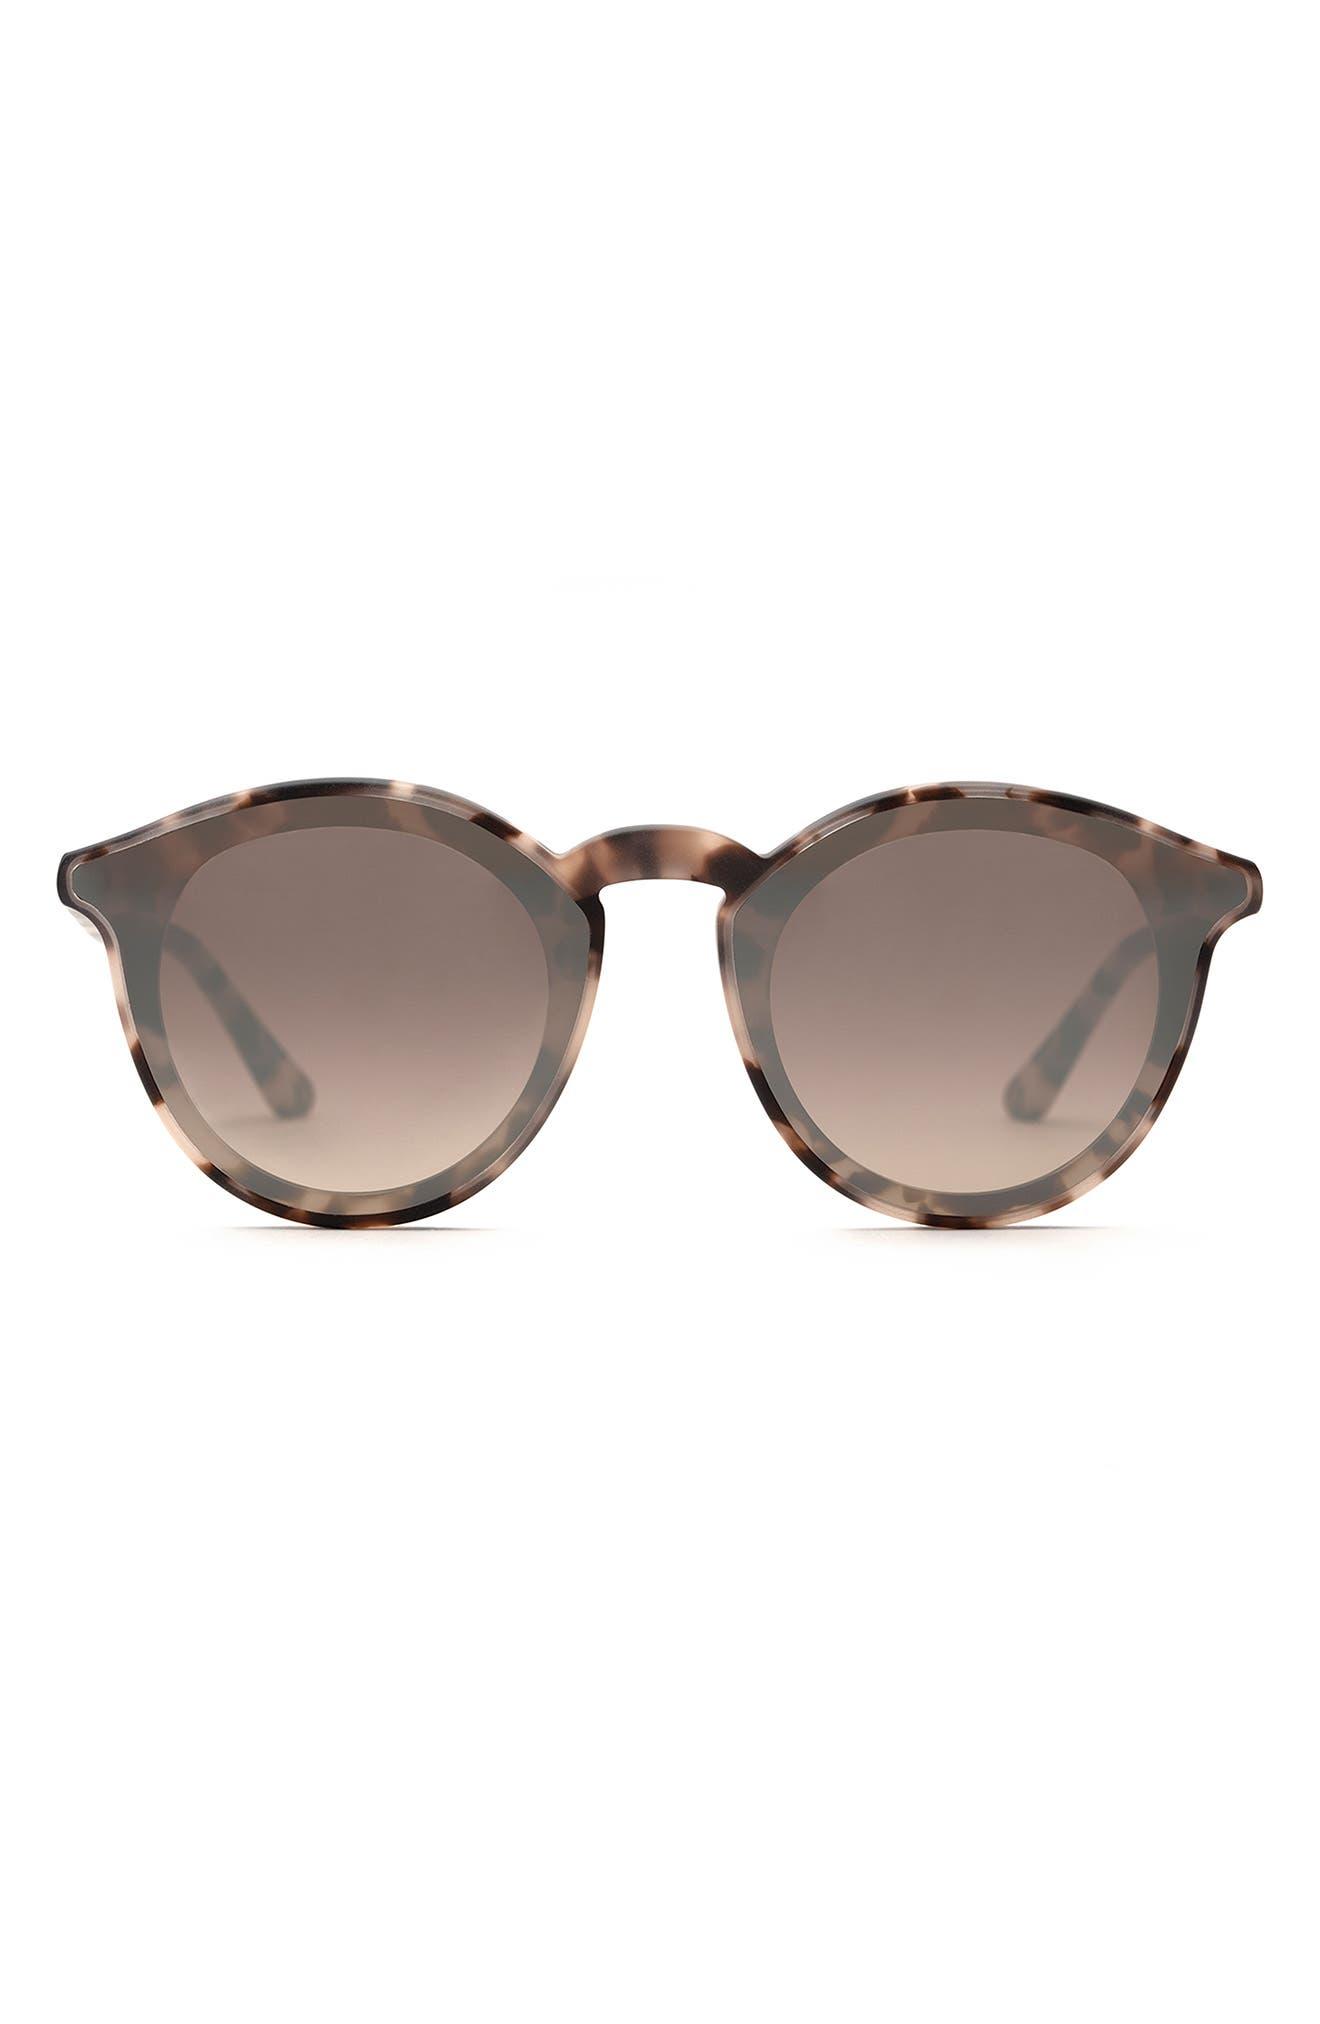 Collins 62mm Gradient Oversize Round Sunglasses